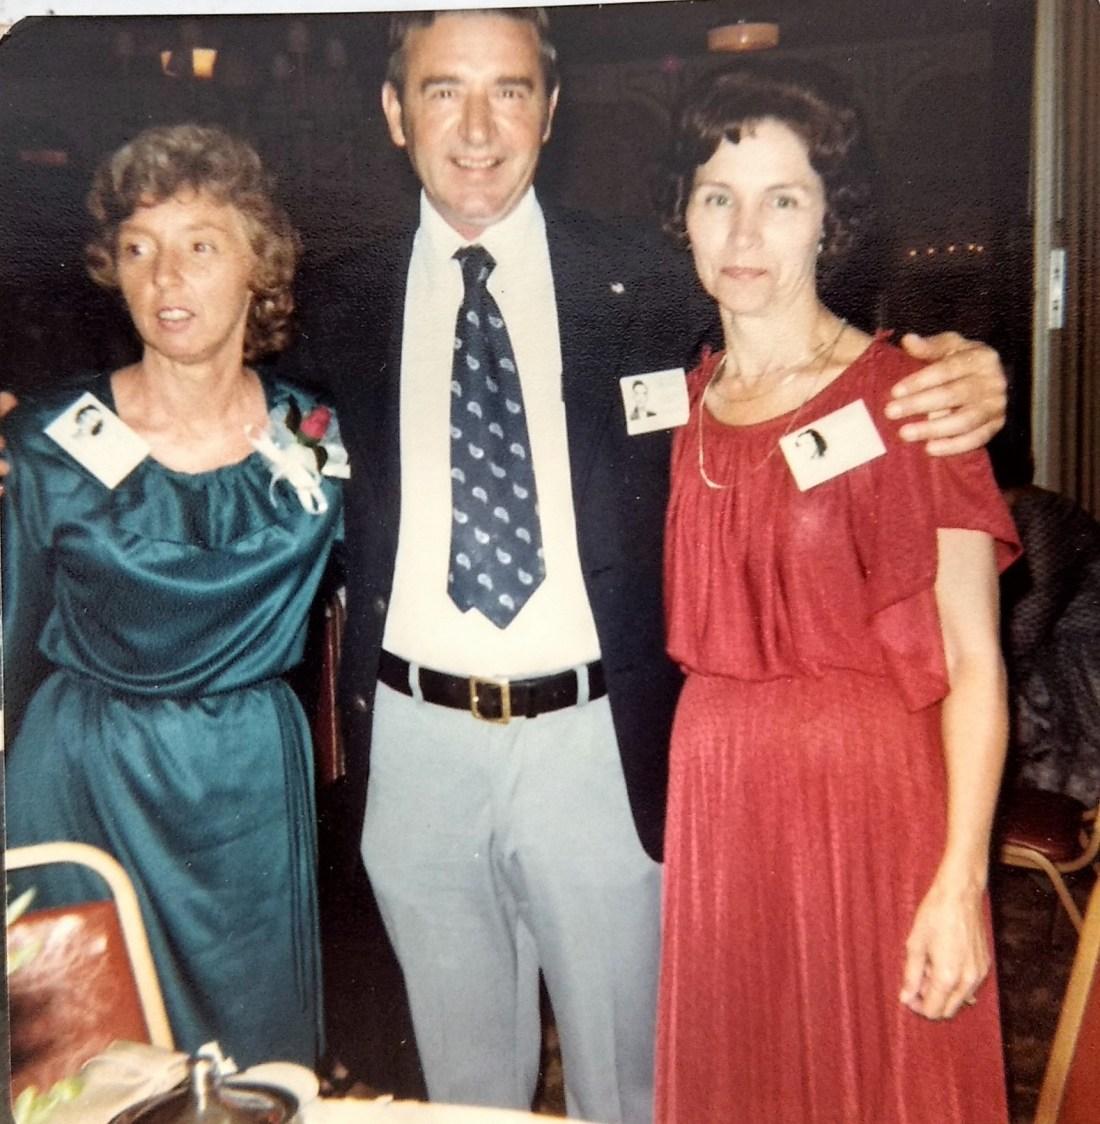 Helen, Billy Garman and Kathleen Taylor at High School Reunion